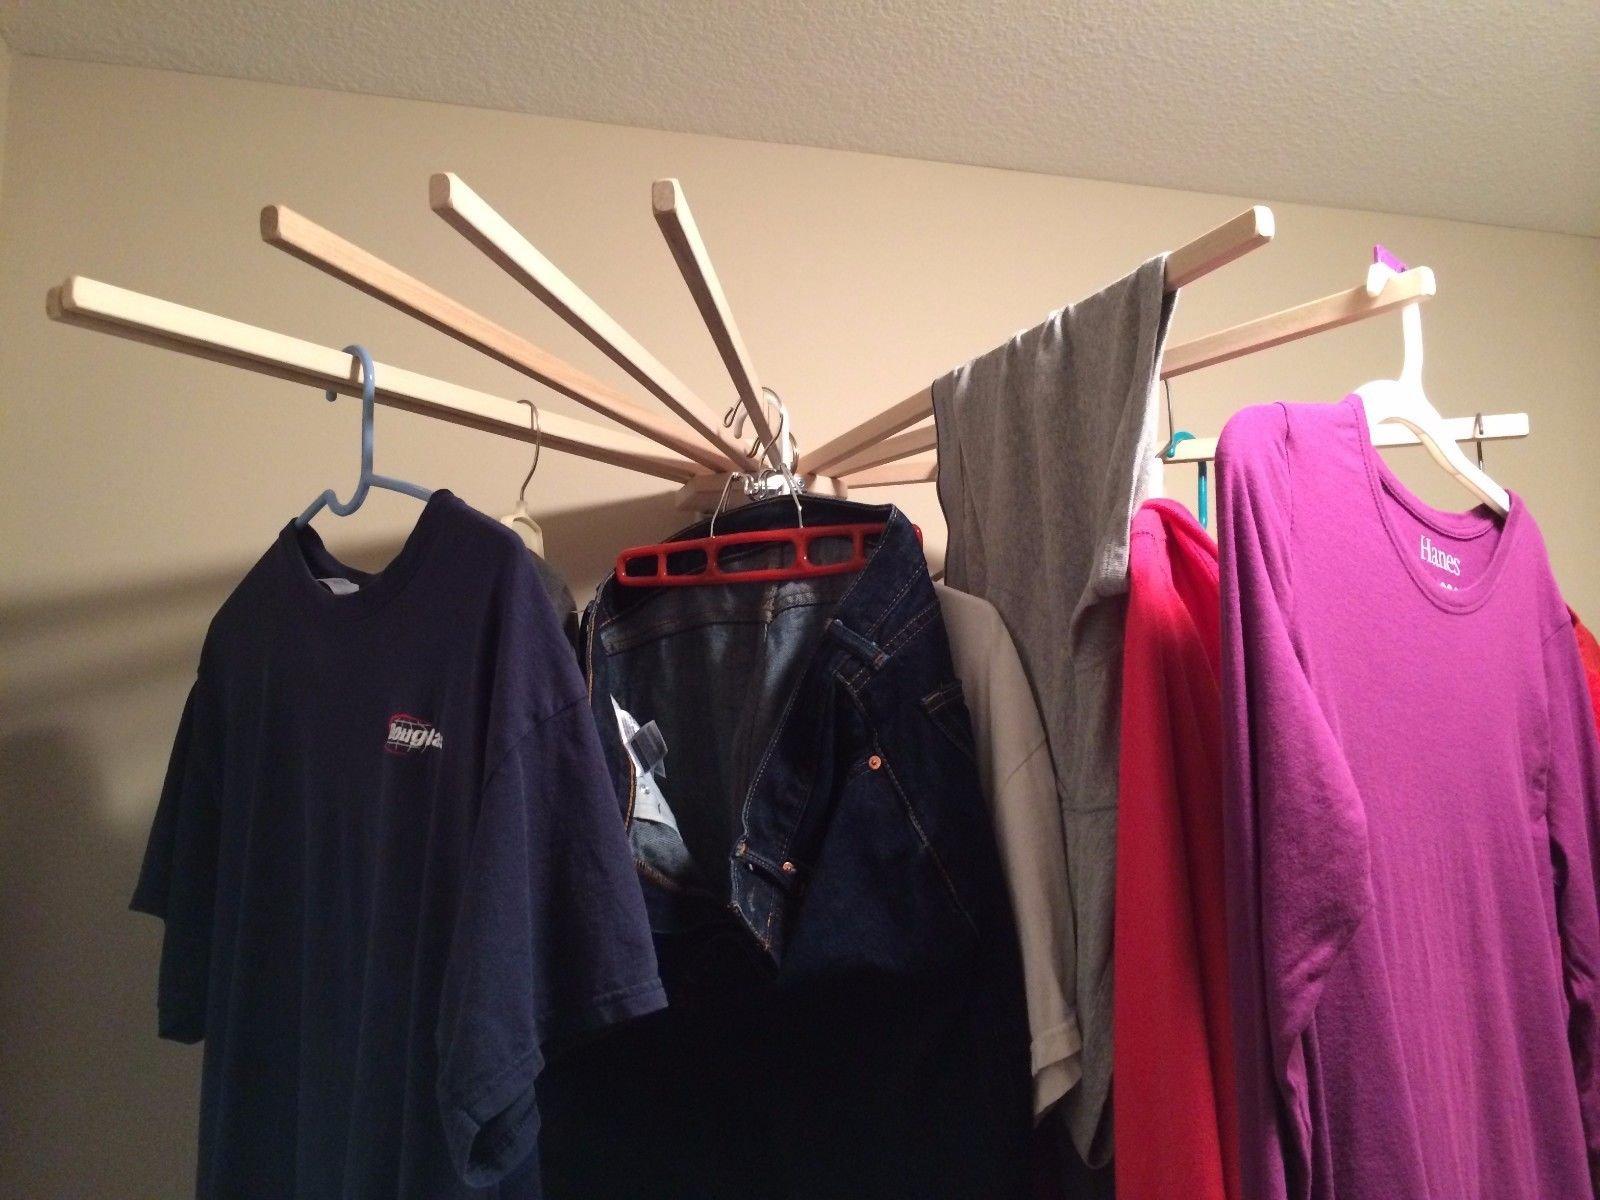 Generic NV_1008003292_YC-US2 Rackhol Mounted Foldable Wall New Indoor ed Fo Laundry Clothes e Lau Household Wood Wall Cloth Drying Rack New Ind by Generic (Image #1)